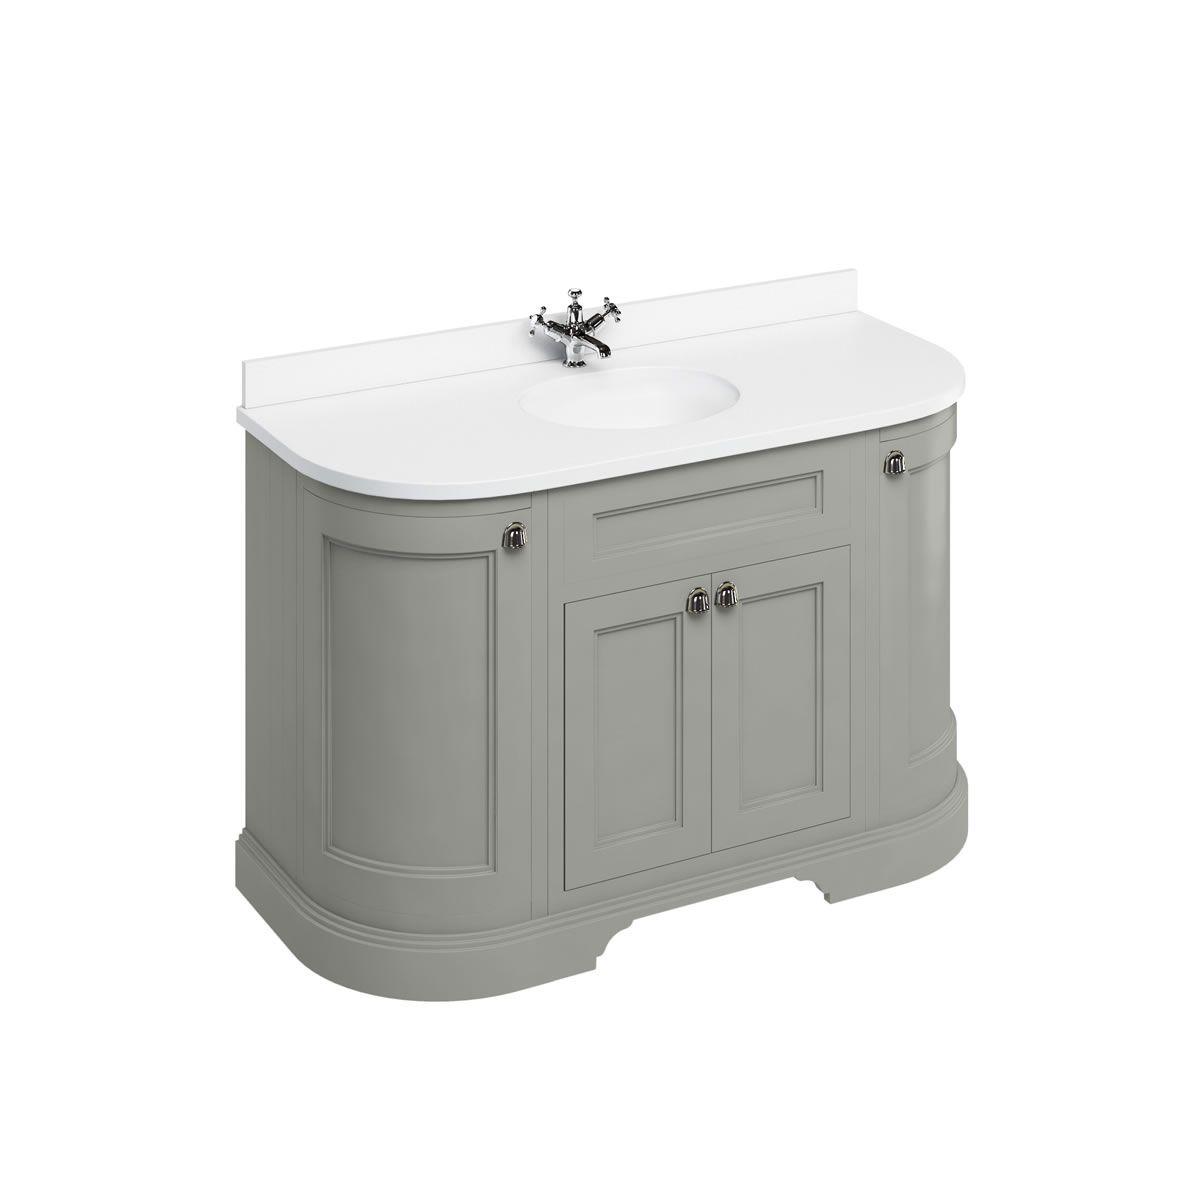 Burlington Dark Olive Freestanding Curved Vanity Unit 1340mm Carrara White